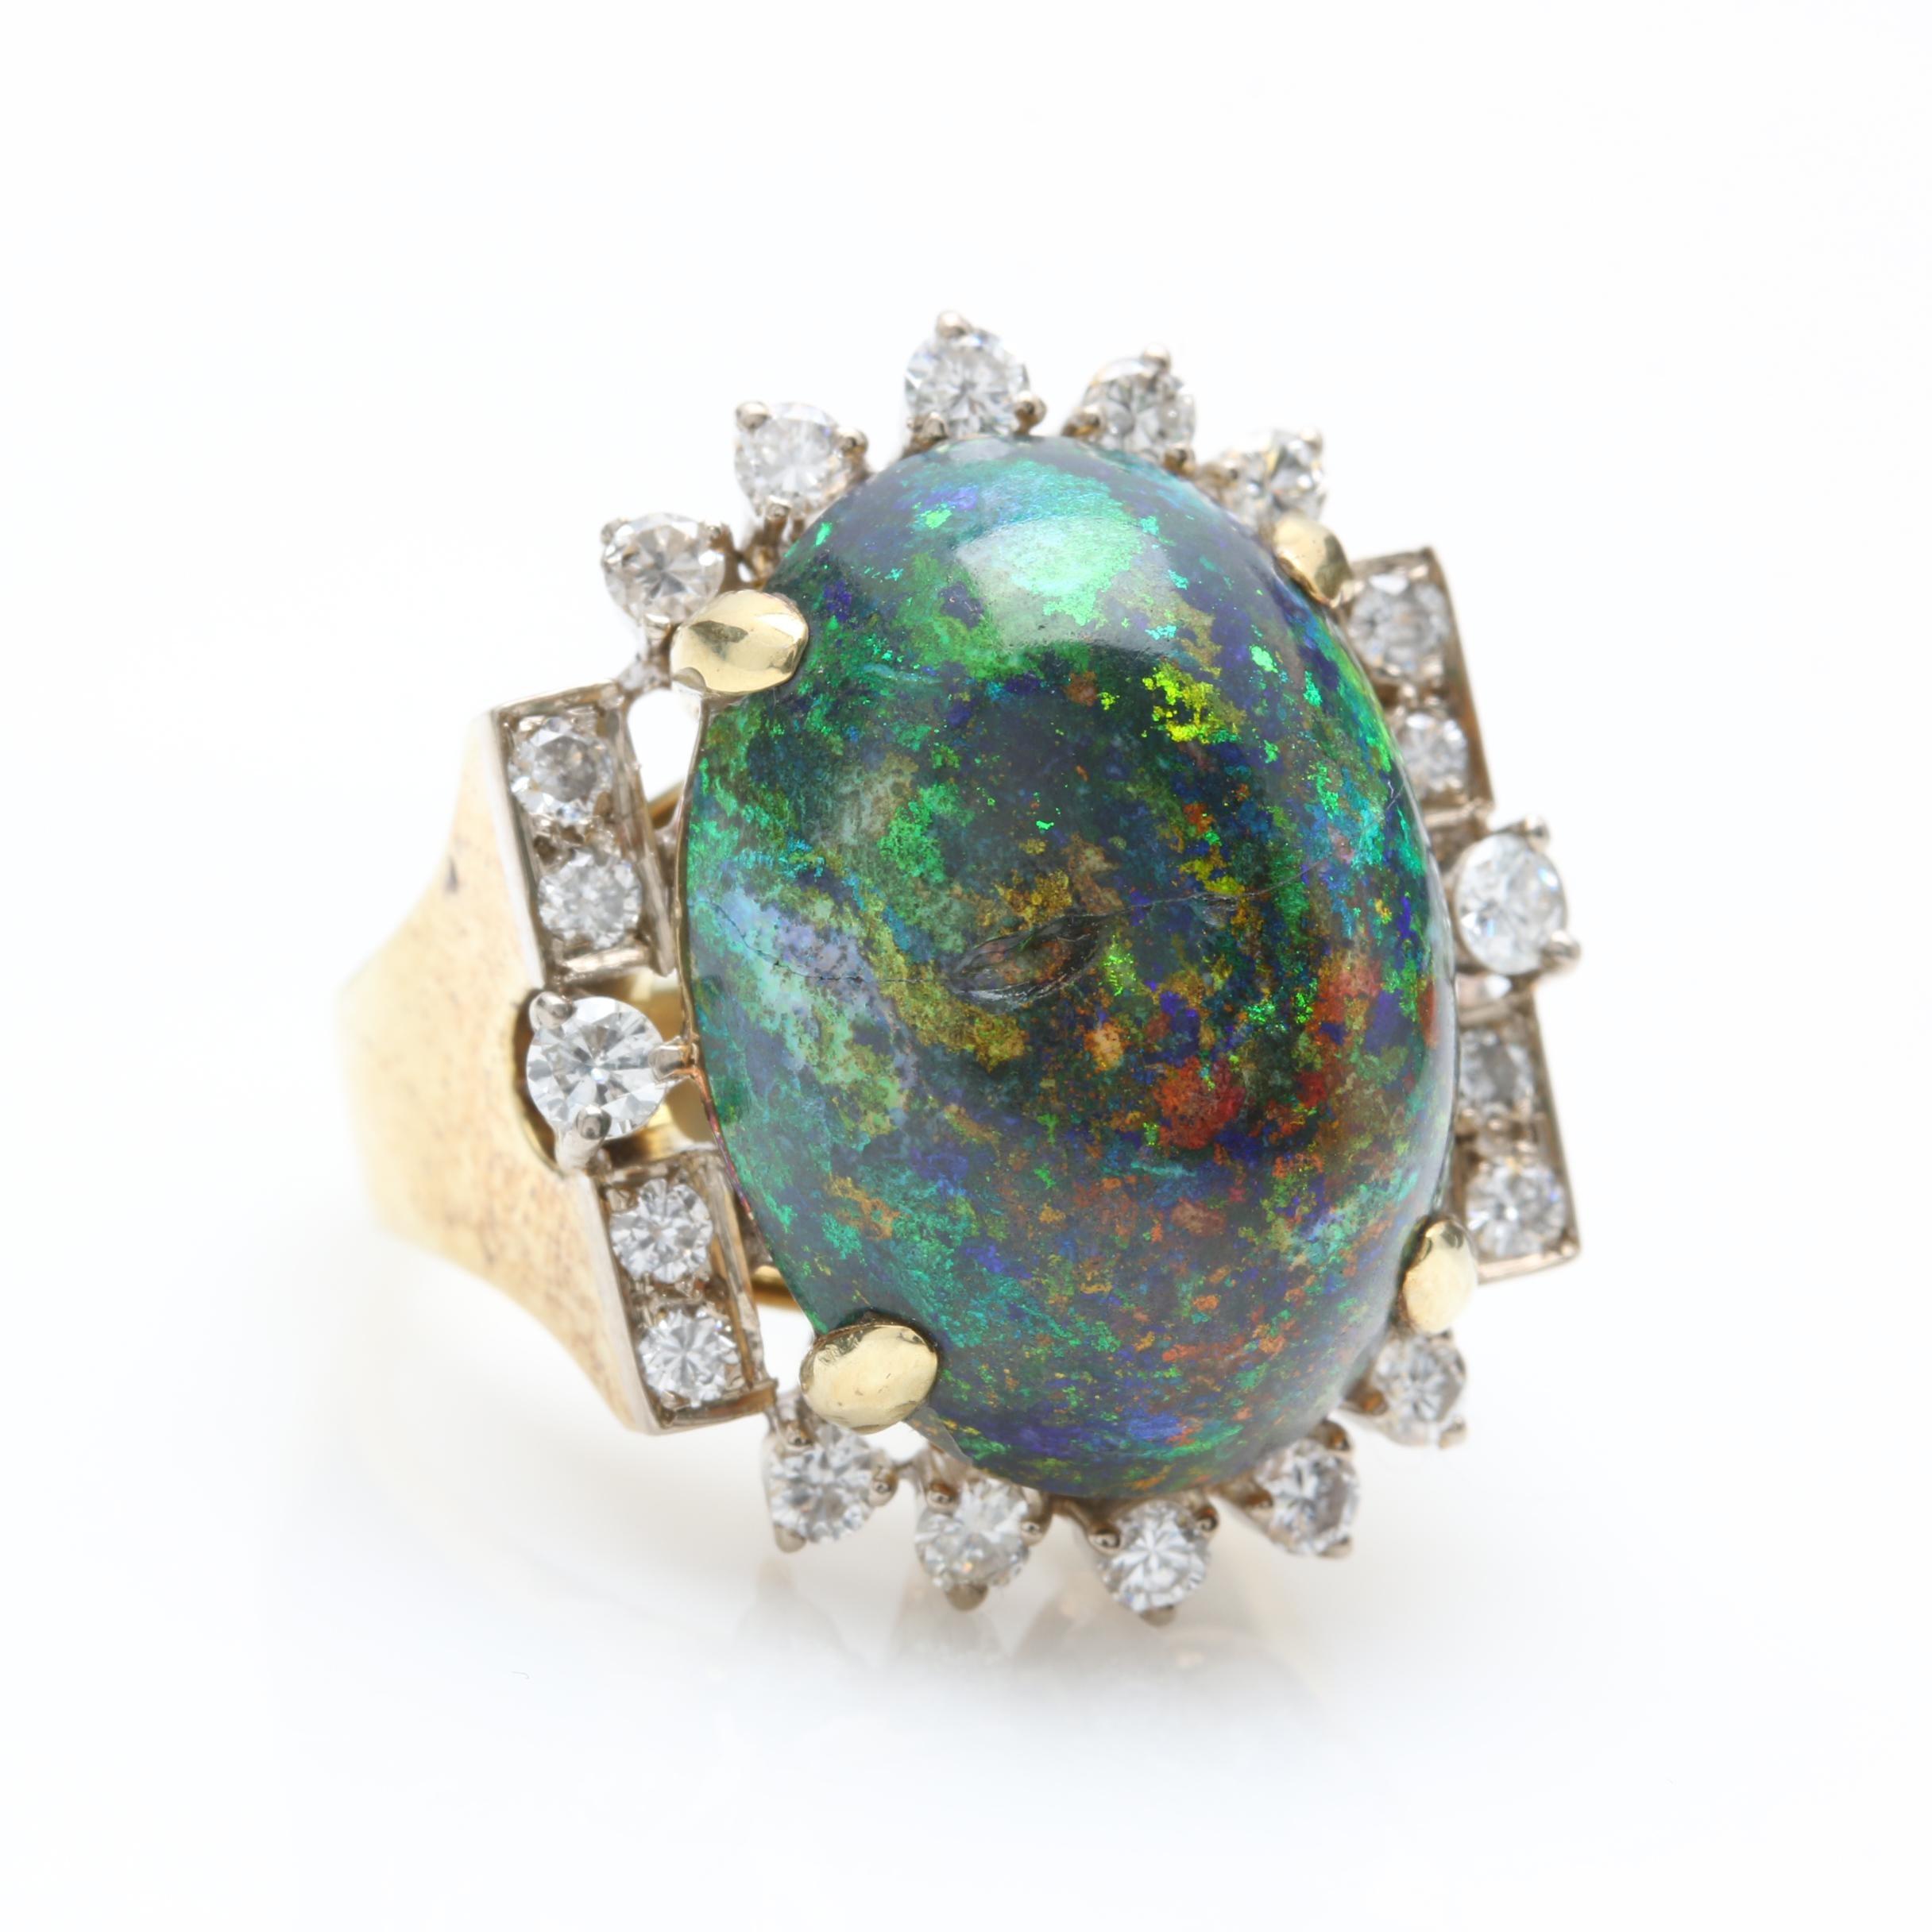 14K Yellow Gold 9.59 CT Opal and Diamond Statement Ring